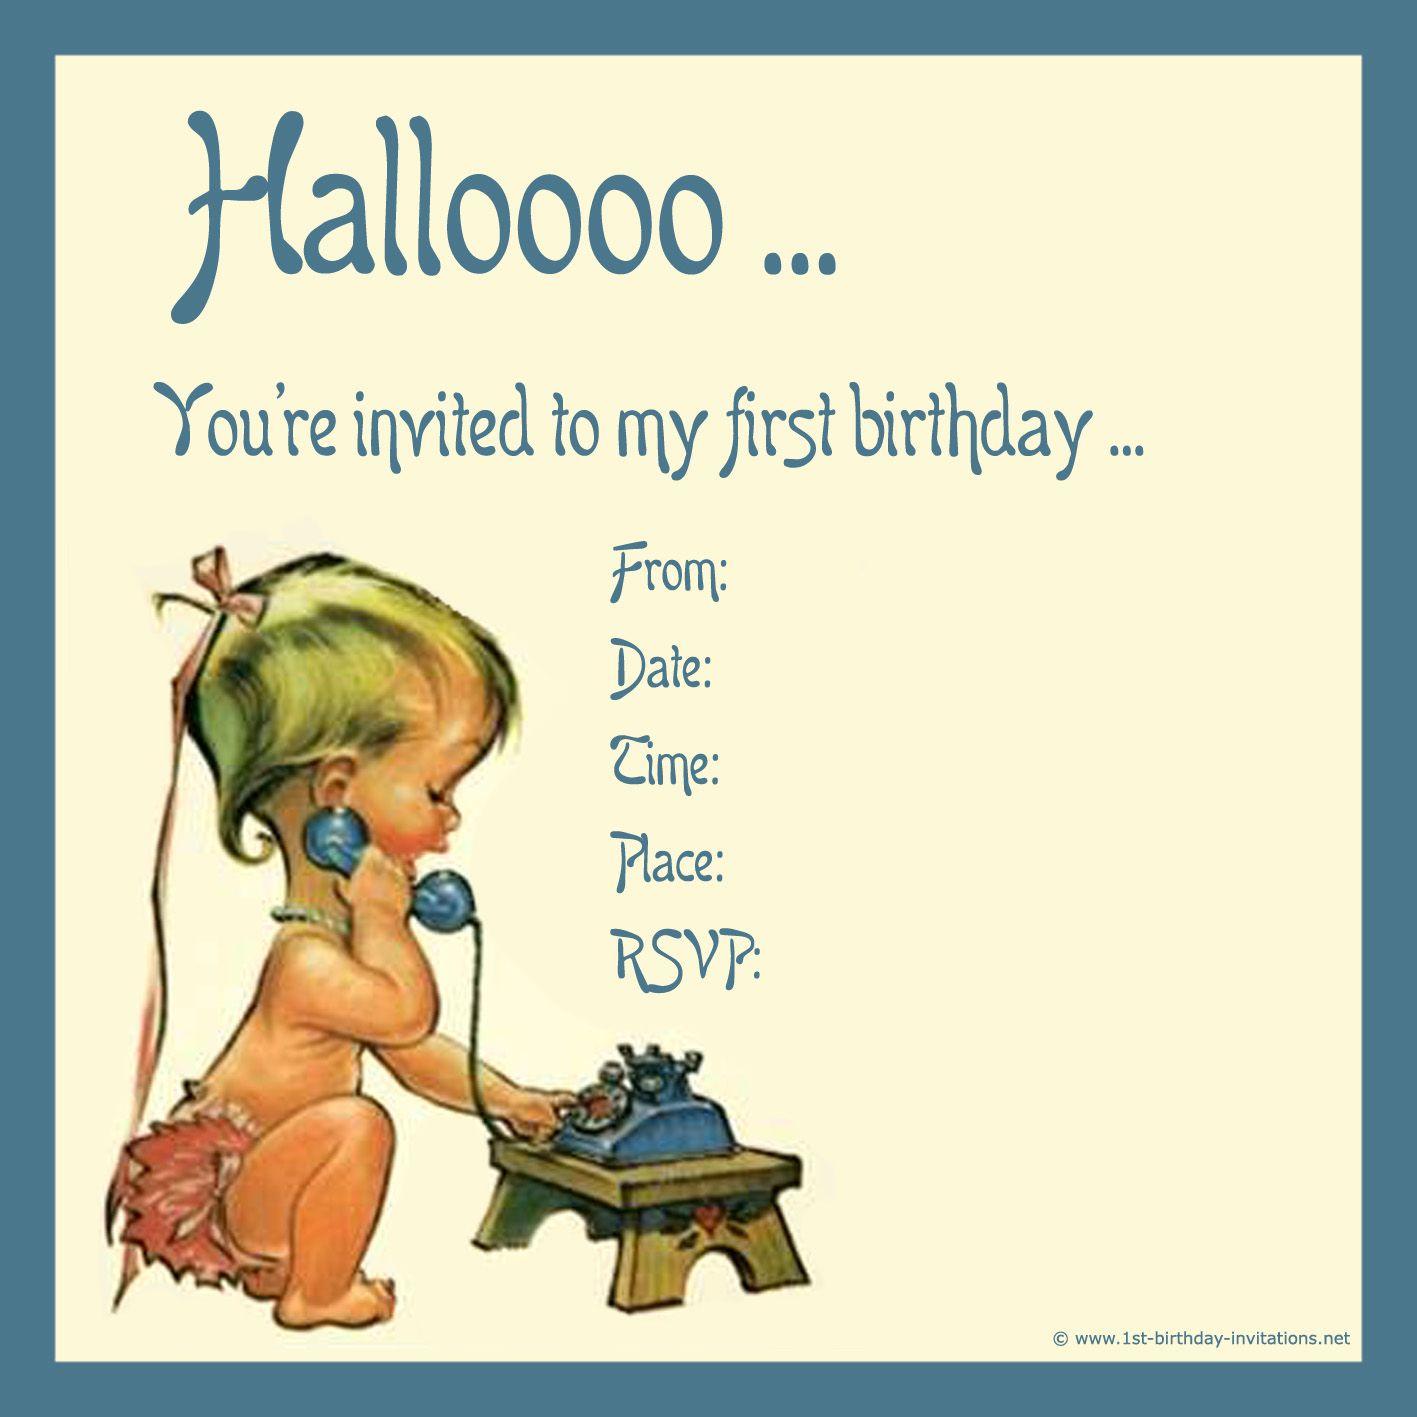 1st birthday party invitation wording hindi cogimbo 1st birthday party invitation wording hindi pictures reference stopboris Gallery